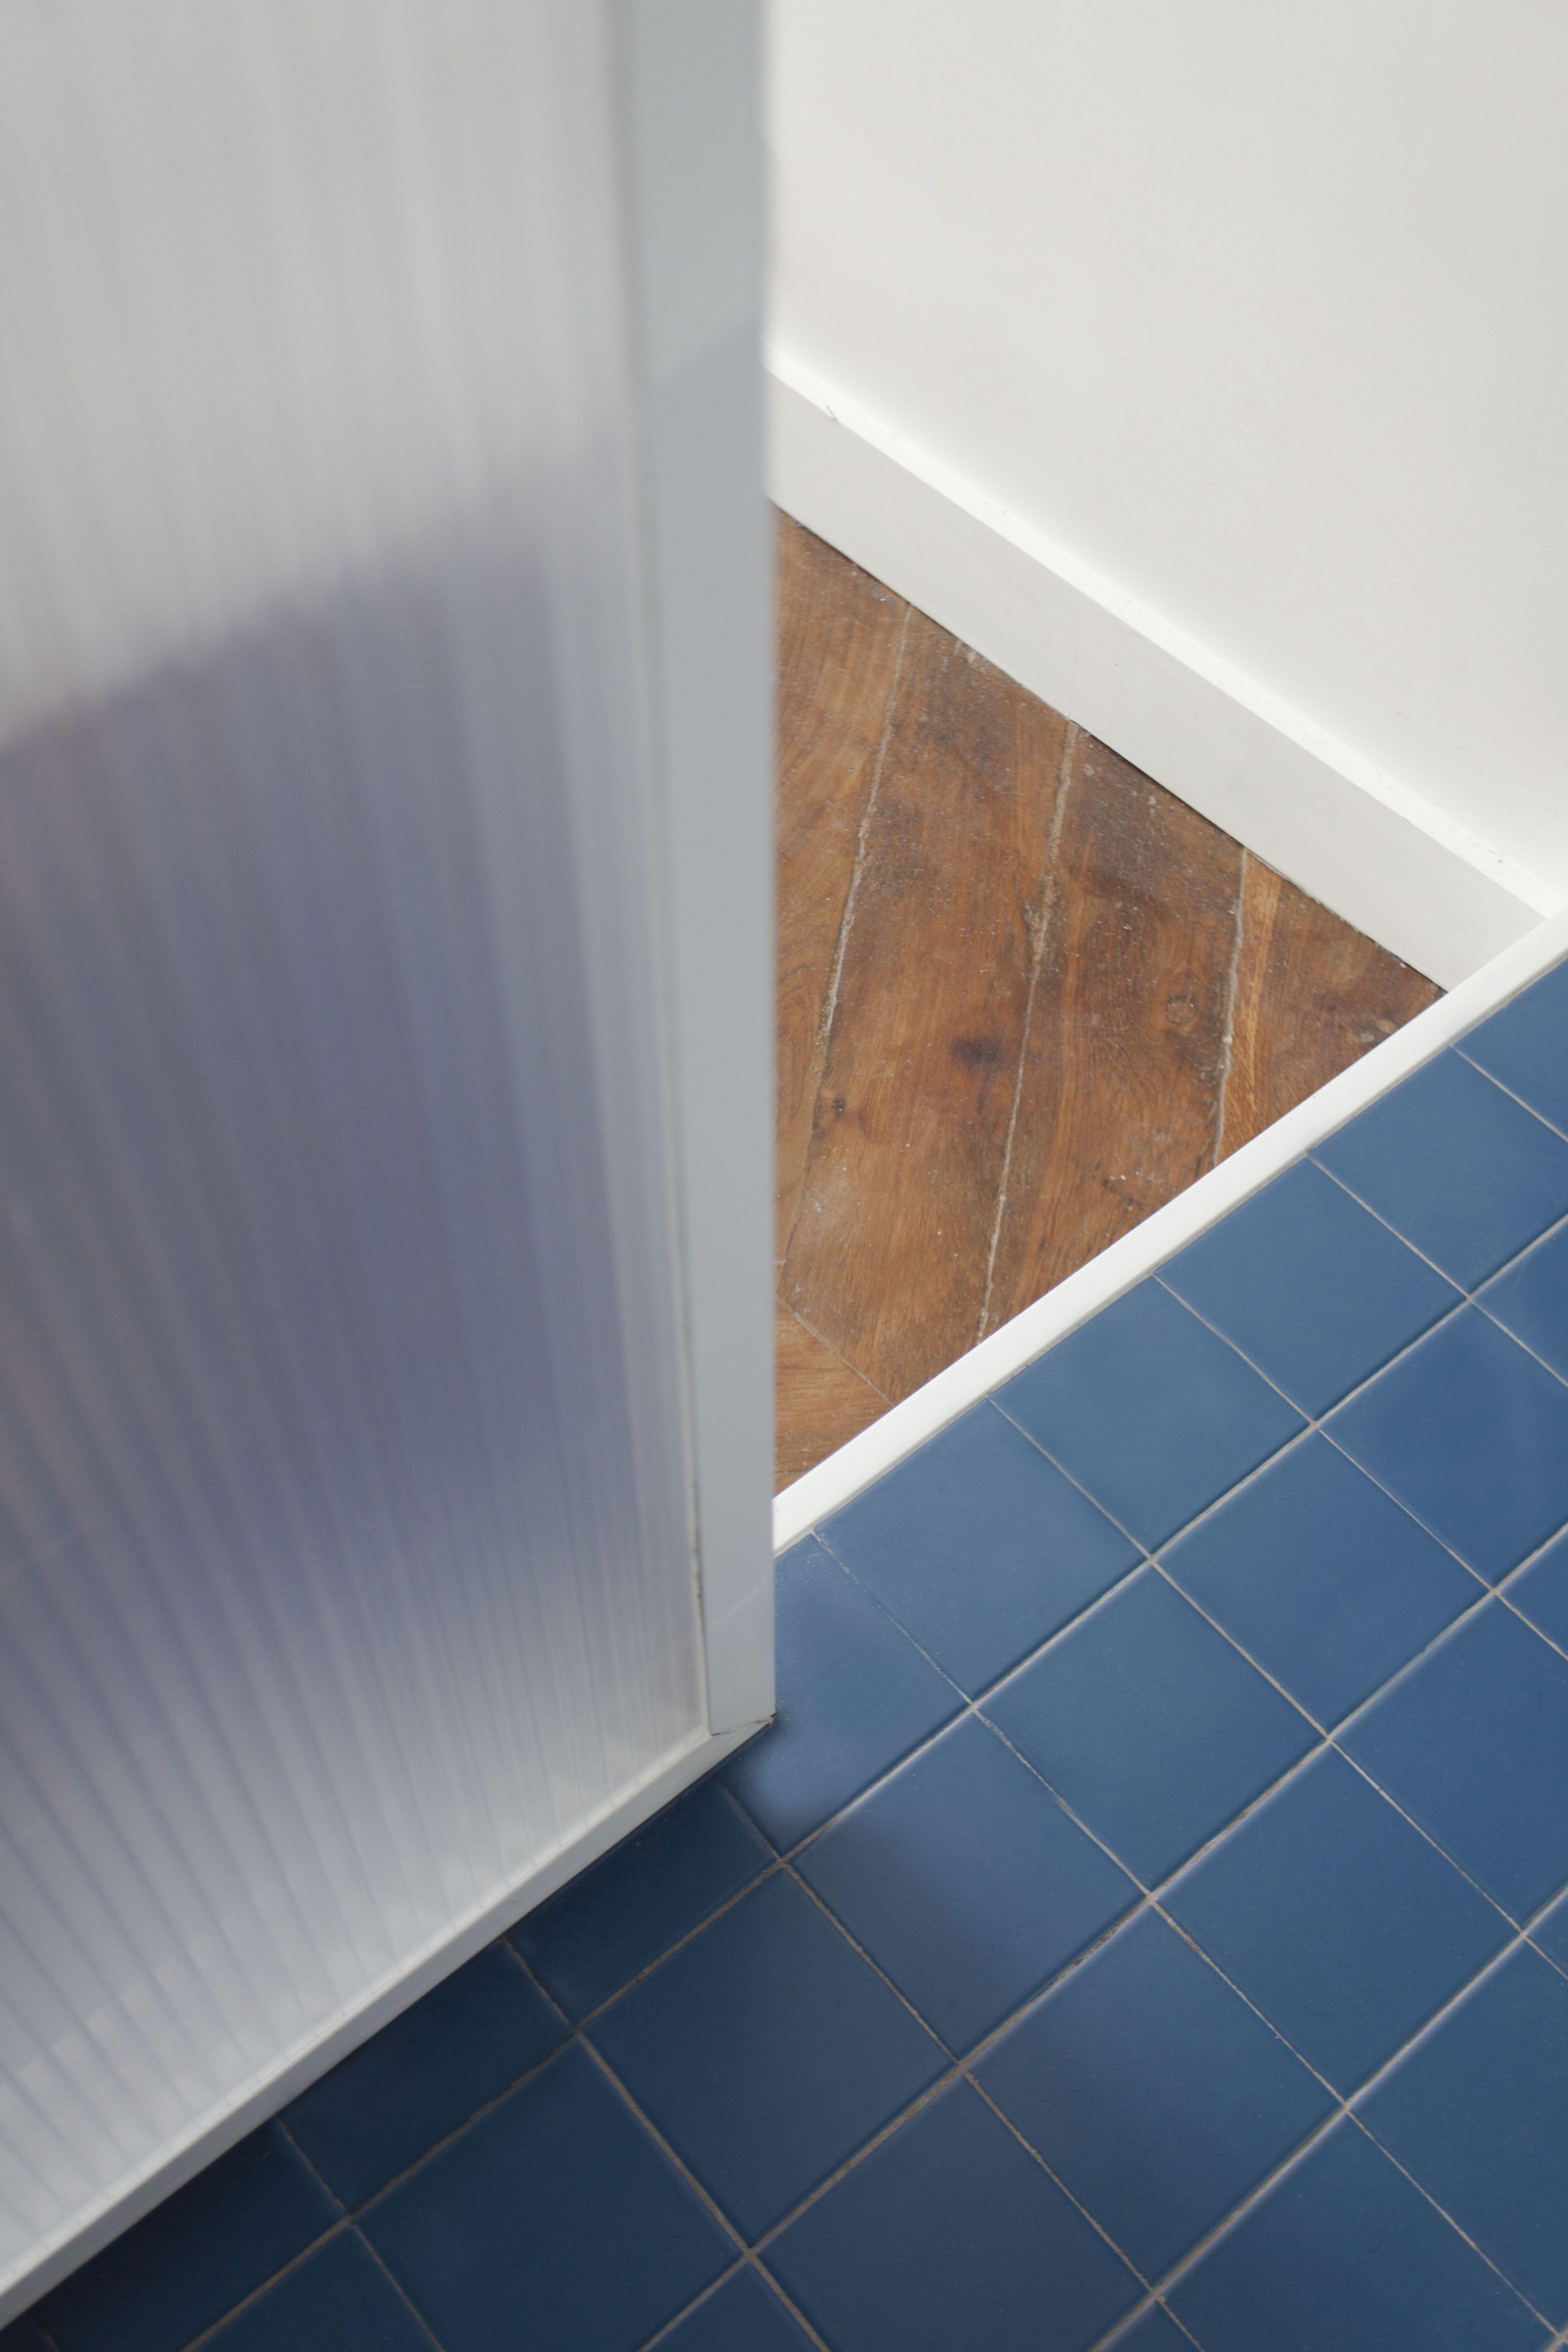 Tiles Pvc Plastic Tiling Lines Pure Brut Raw White